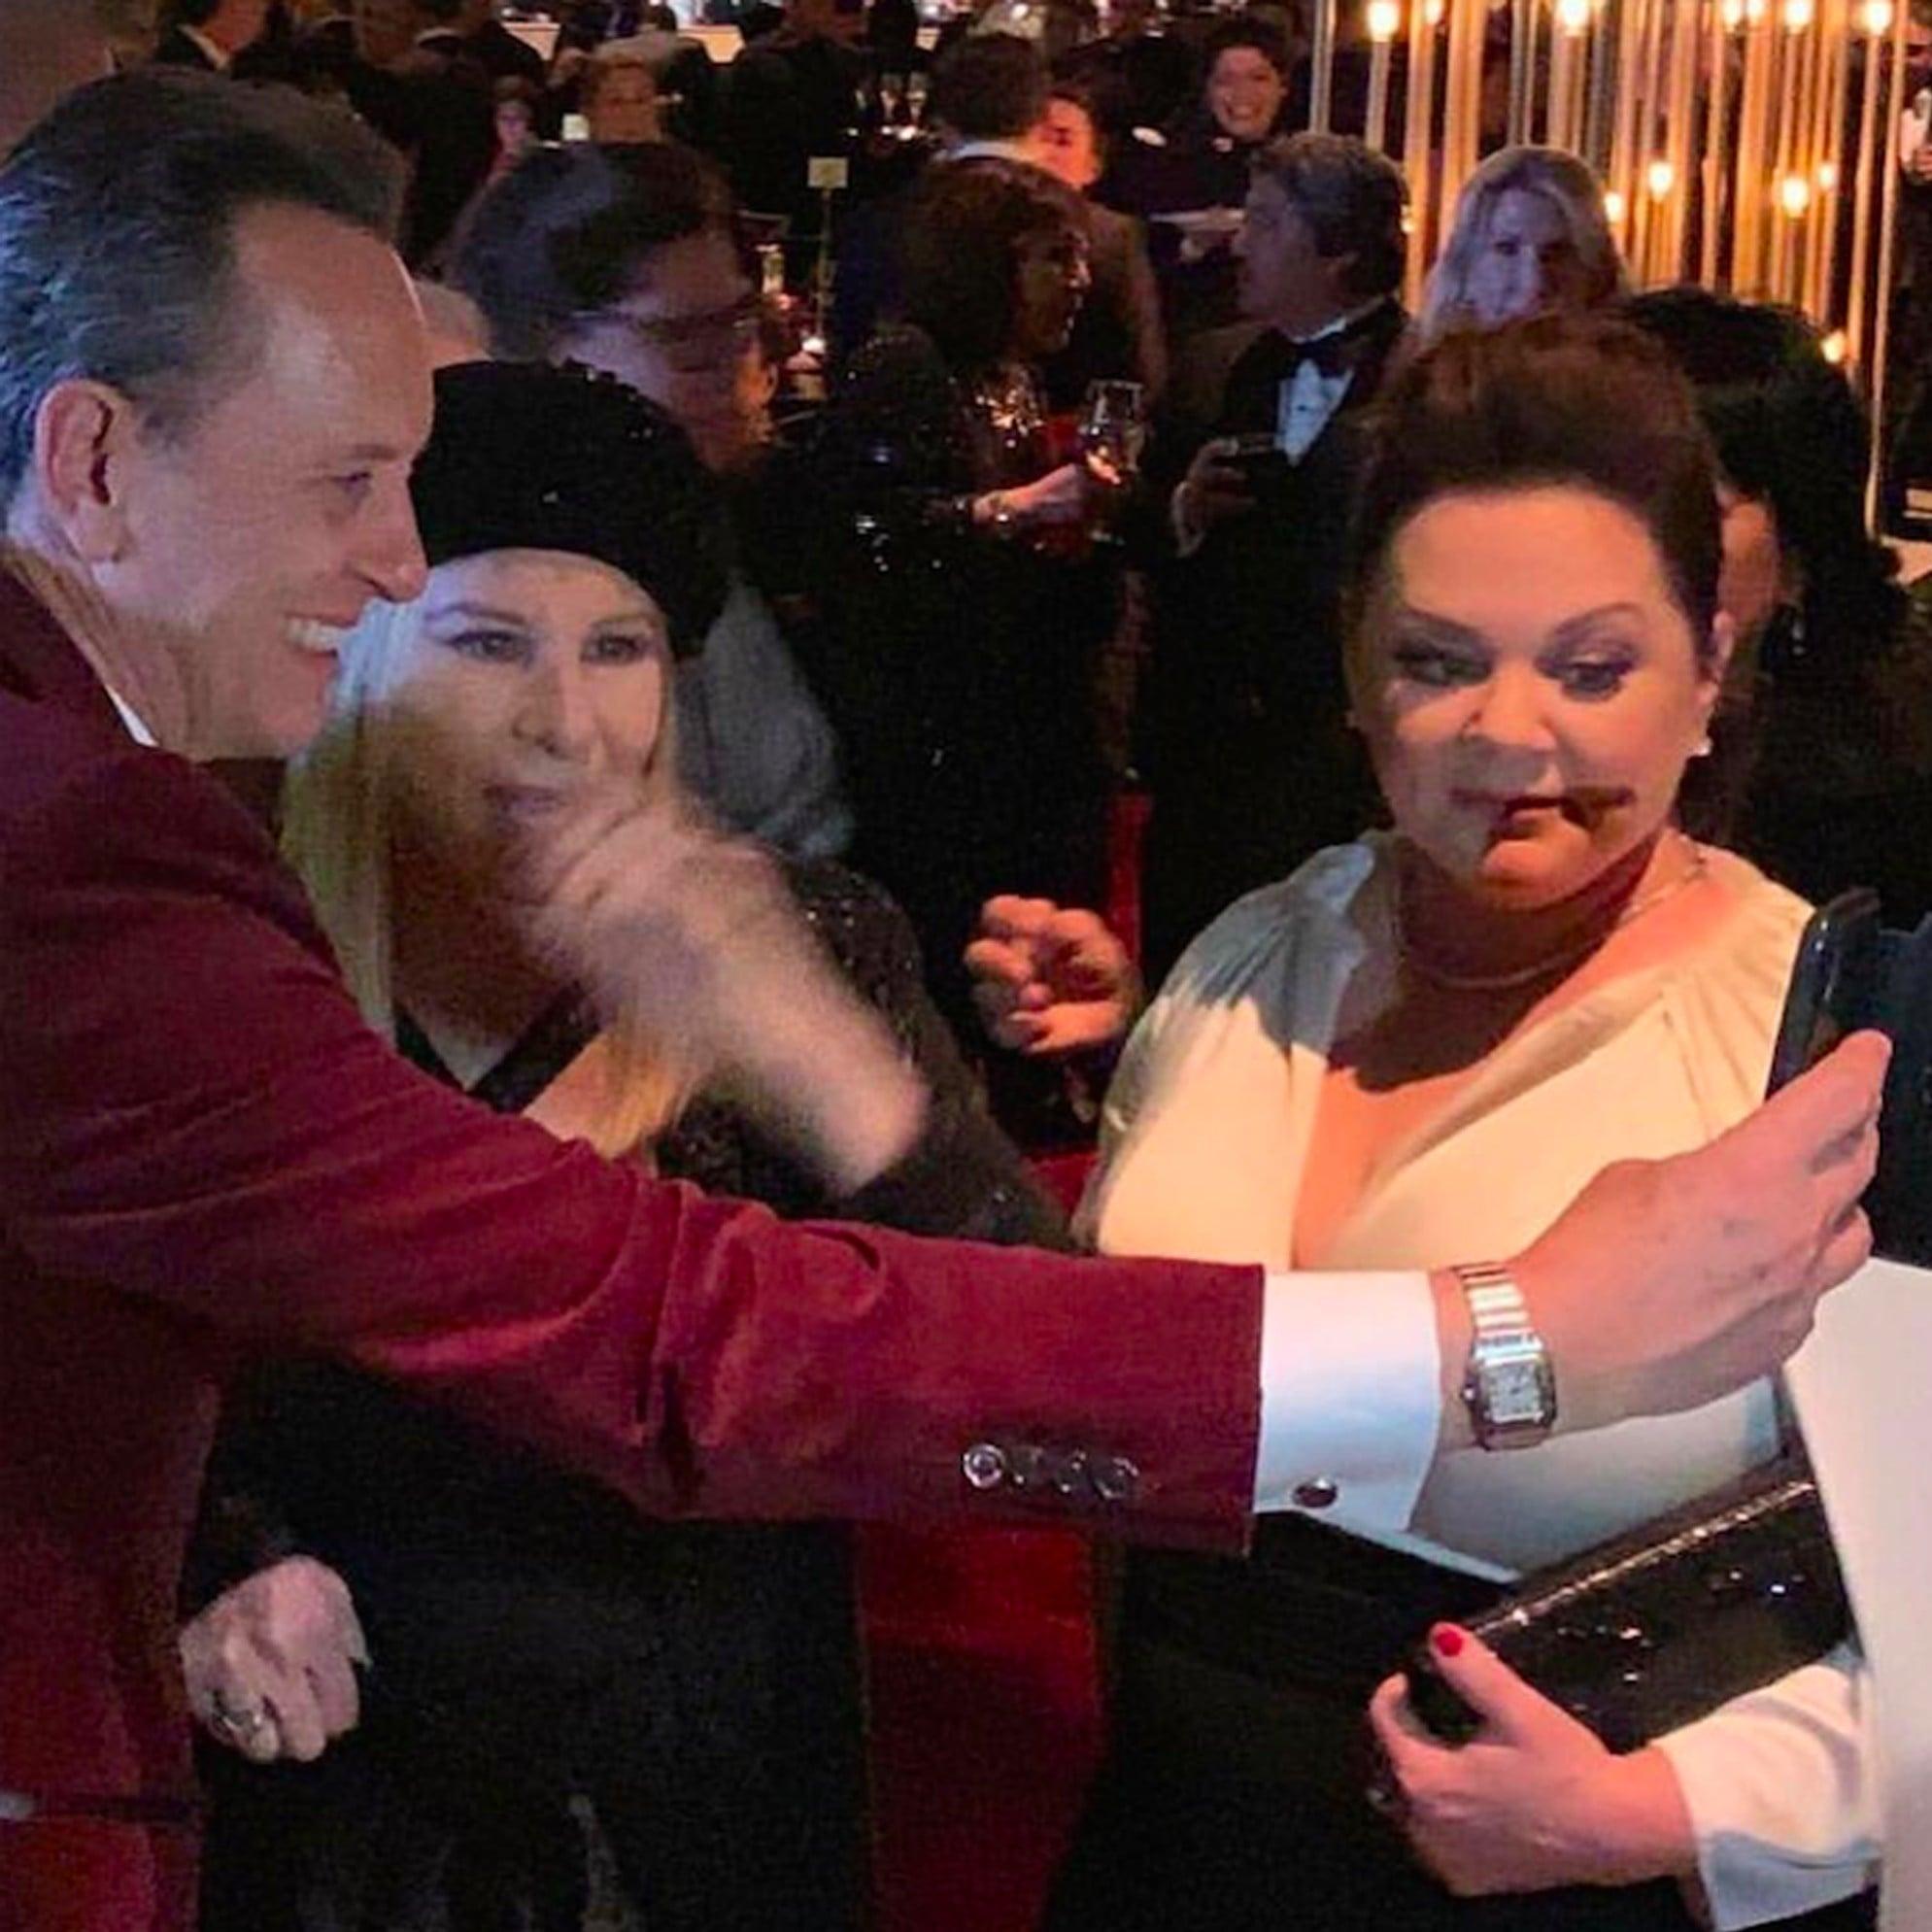 Richard E  Grant Meeting Barbra Streisand at the 2019 Oscars